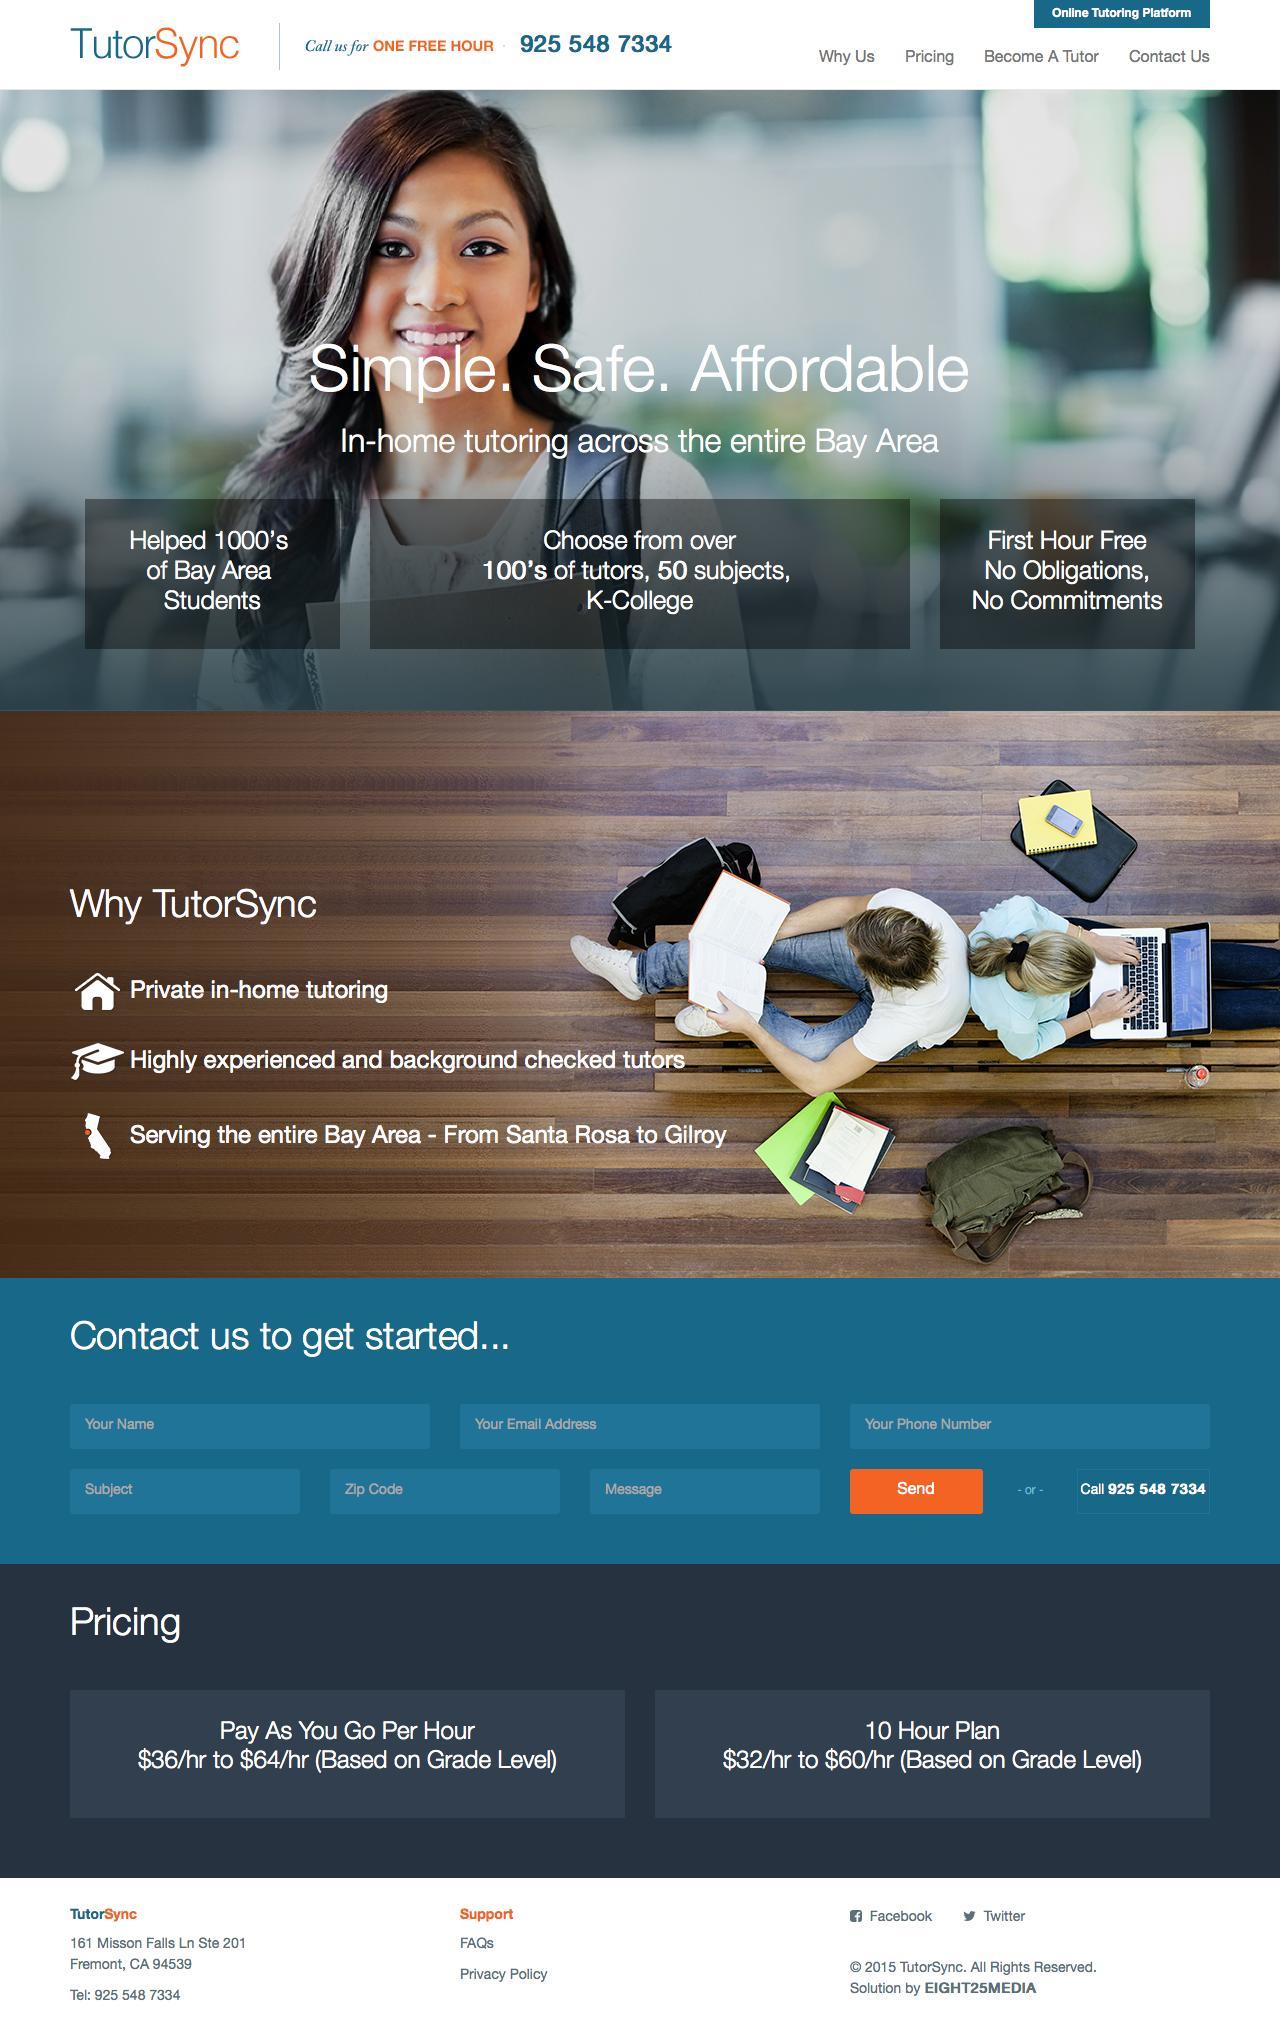 Screenshot of tutorsync.com - California Tutor Service | Bay Area Tutoring to San Diego | OneStopTutoring.com - captured July 27, 2015